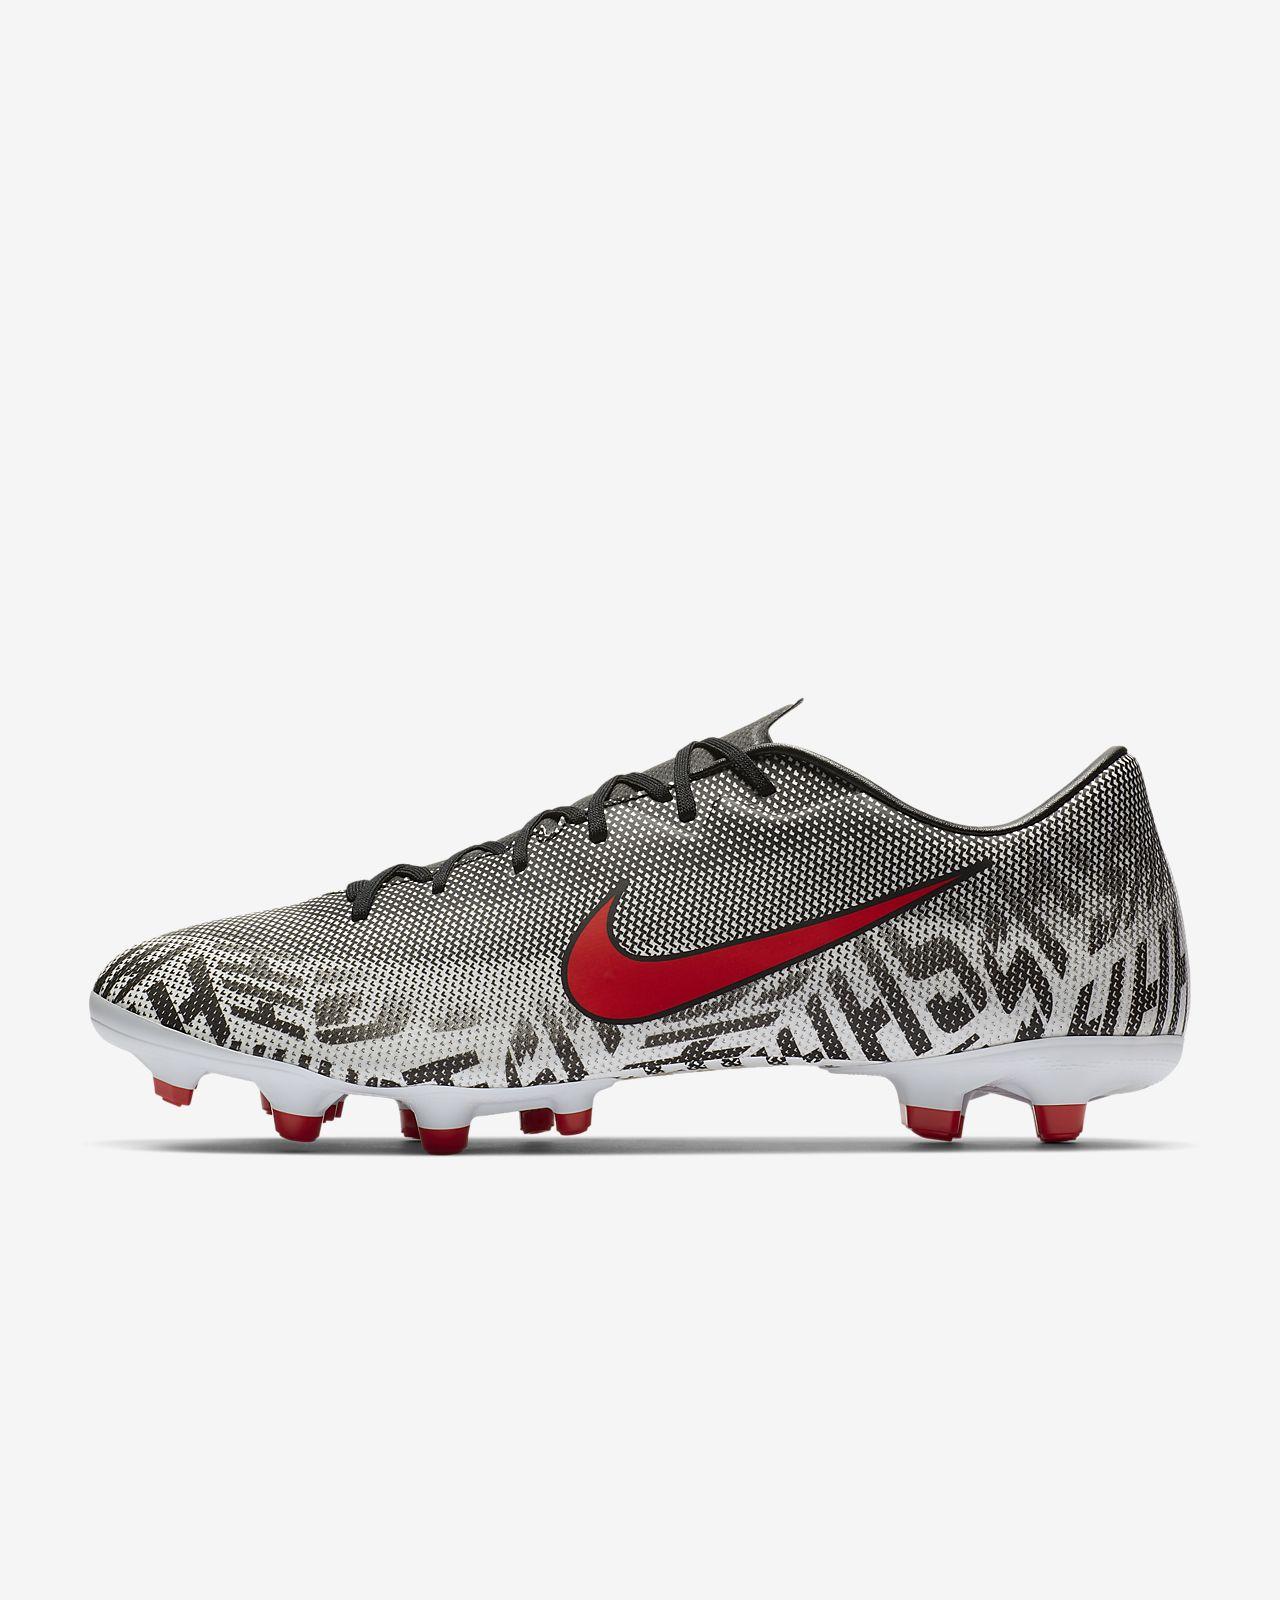 Nike Mercurial Vapor XII Academy Neymar Multi-Ground Football Boot ... f4b487e2f4ed8